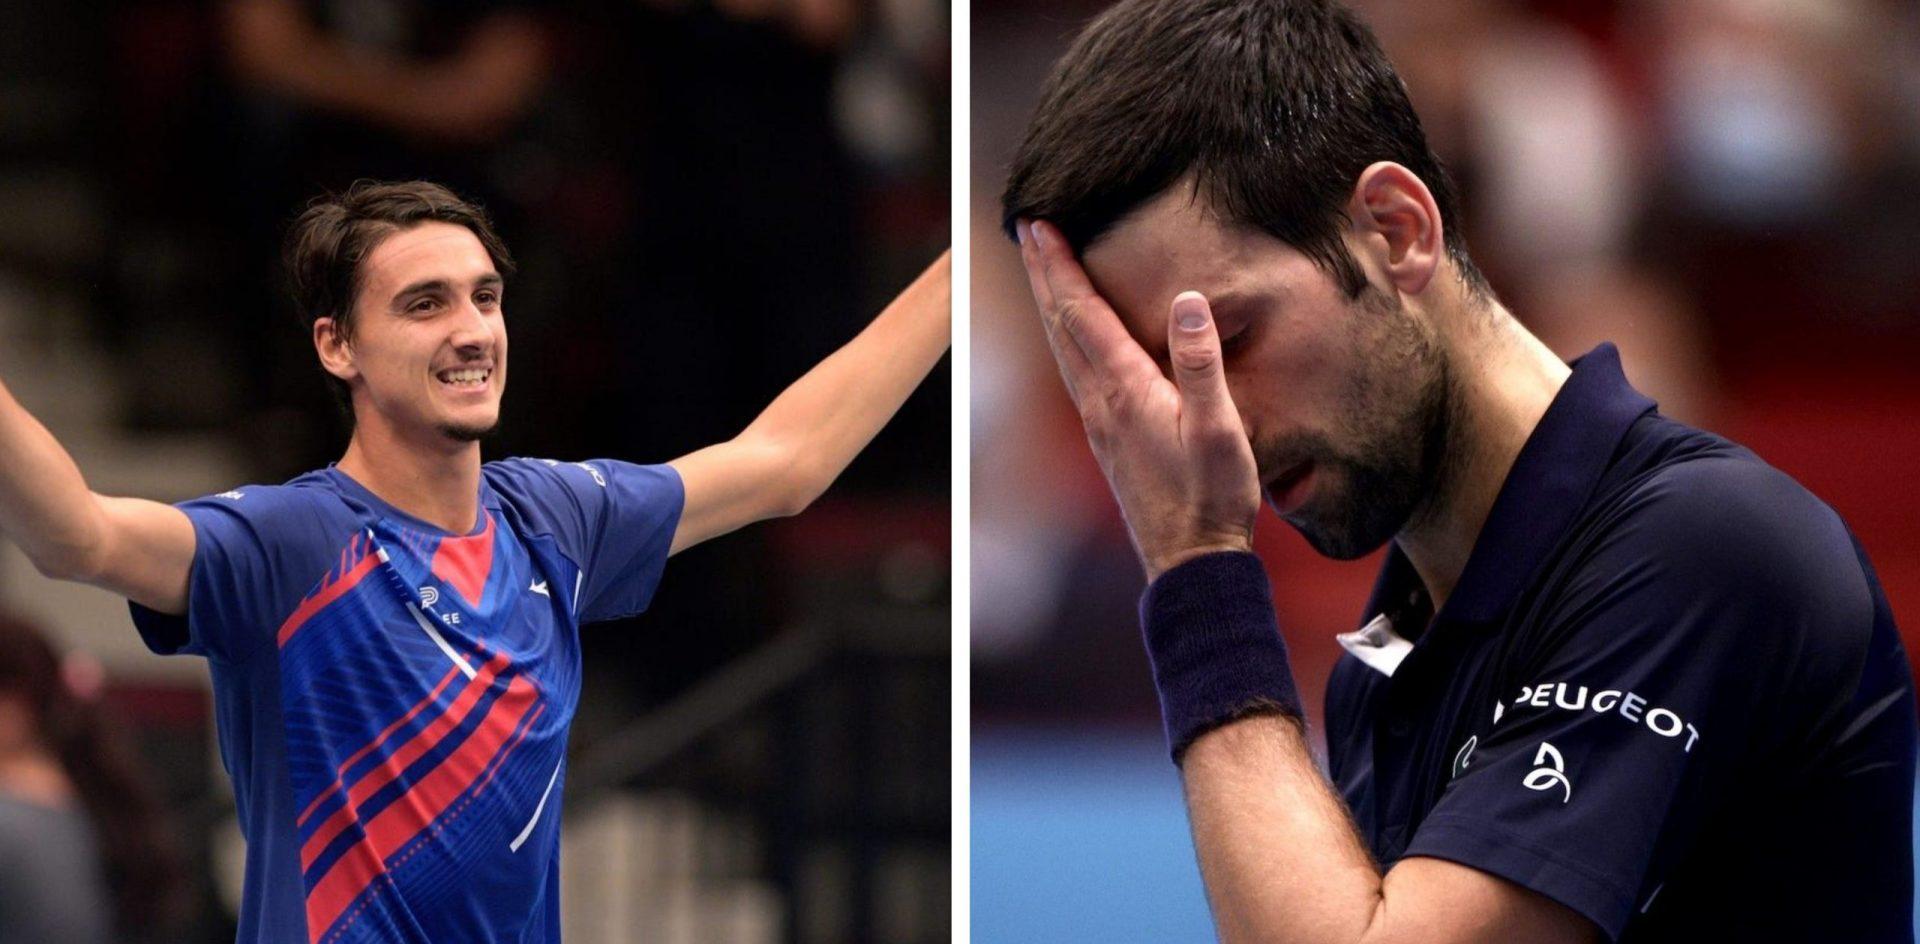 A break on Djoker's juggernaut-Novak Djokovic suffers stunning loss in the Vienna Open - THE SPORTS ROOM